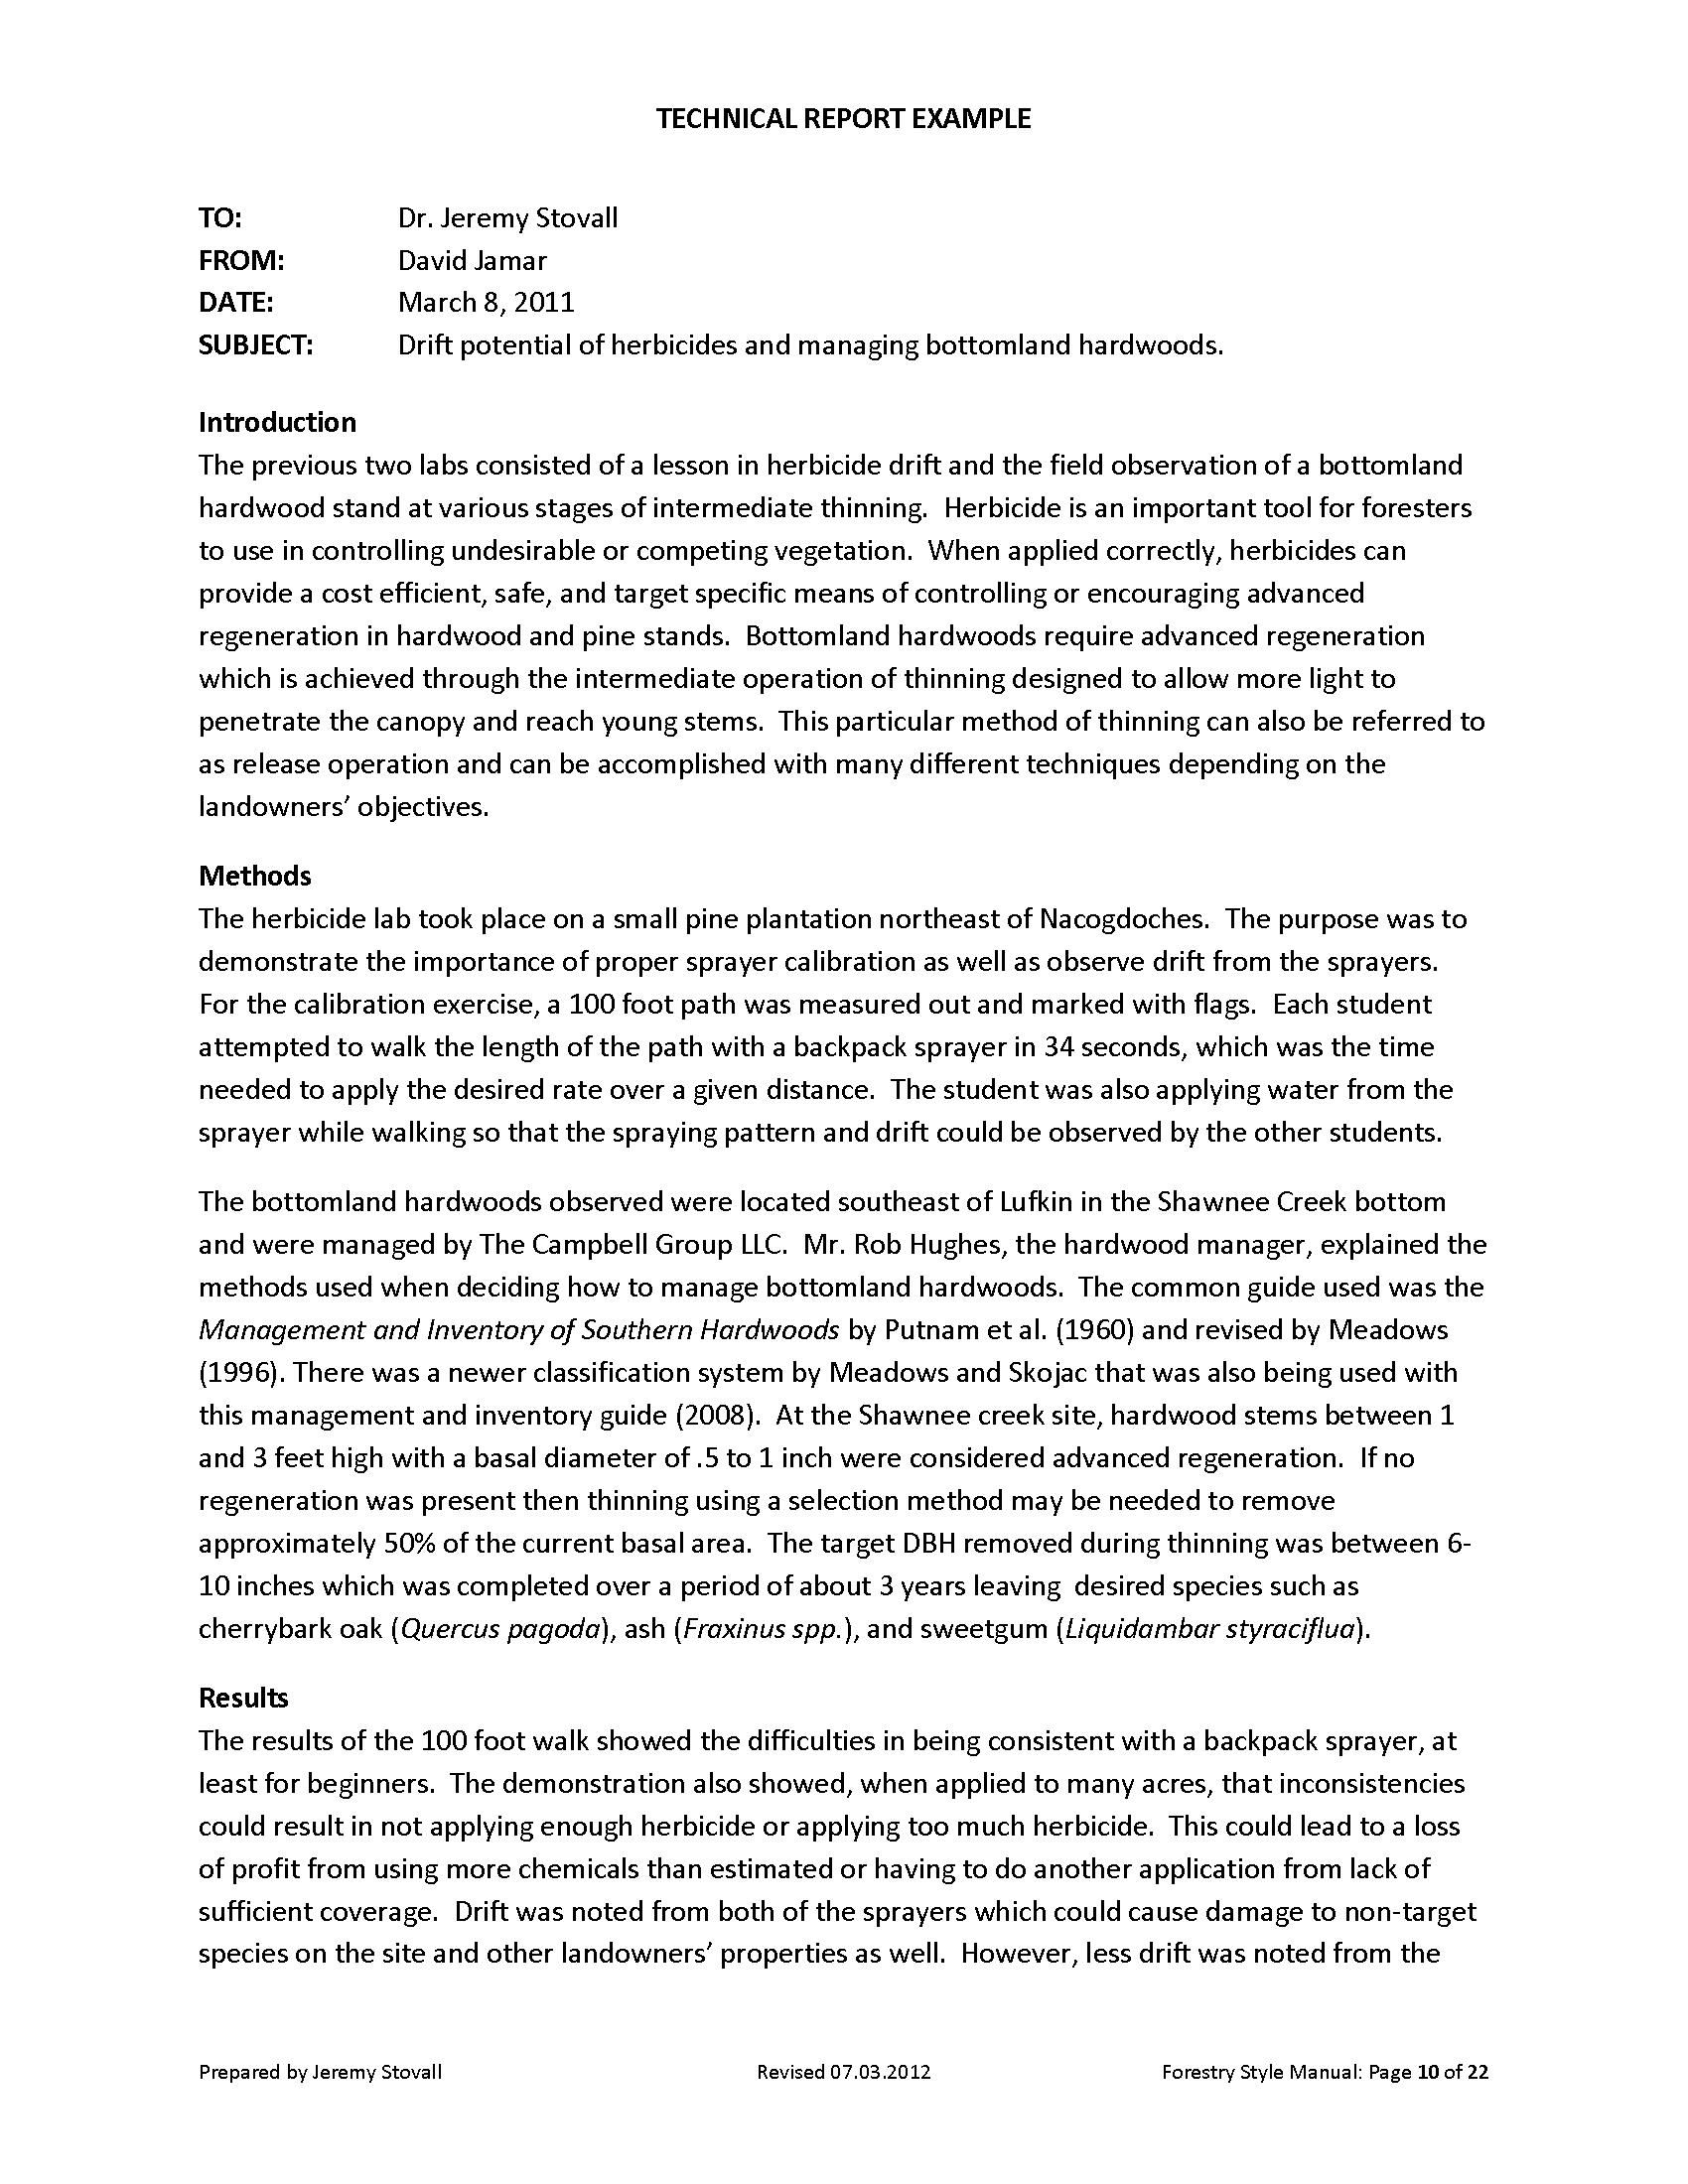 Cbest essay topics